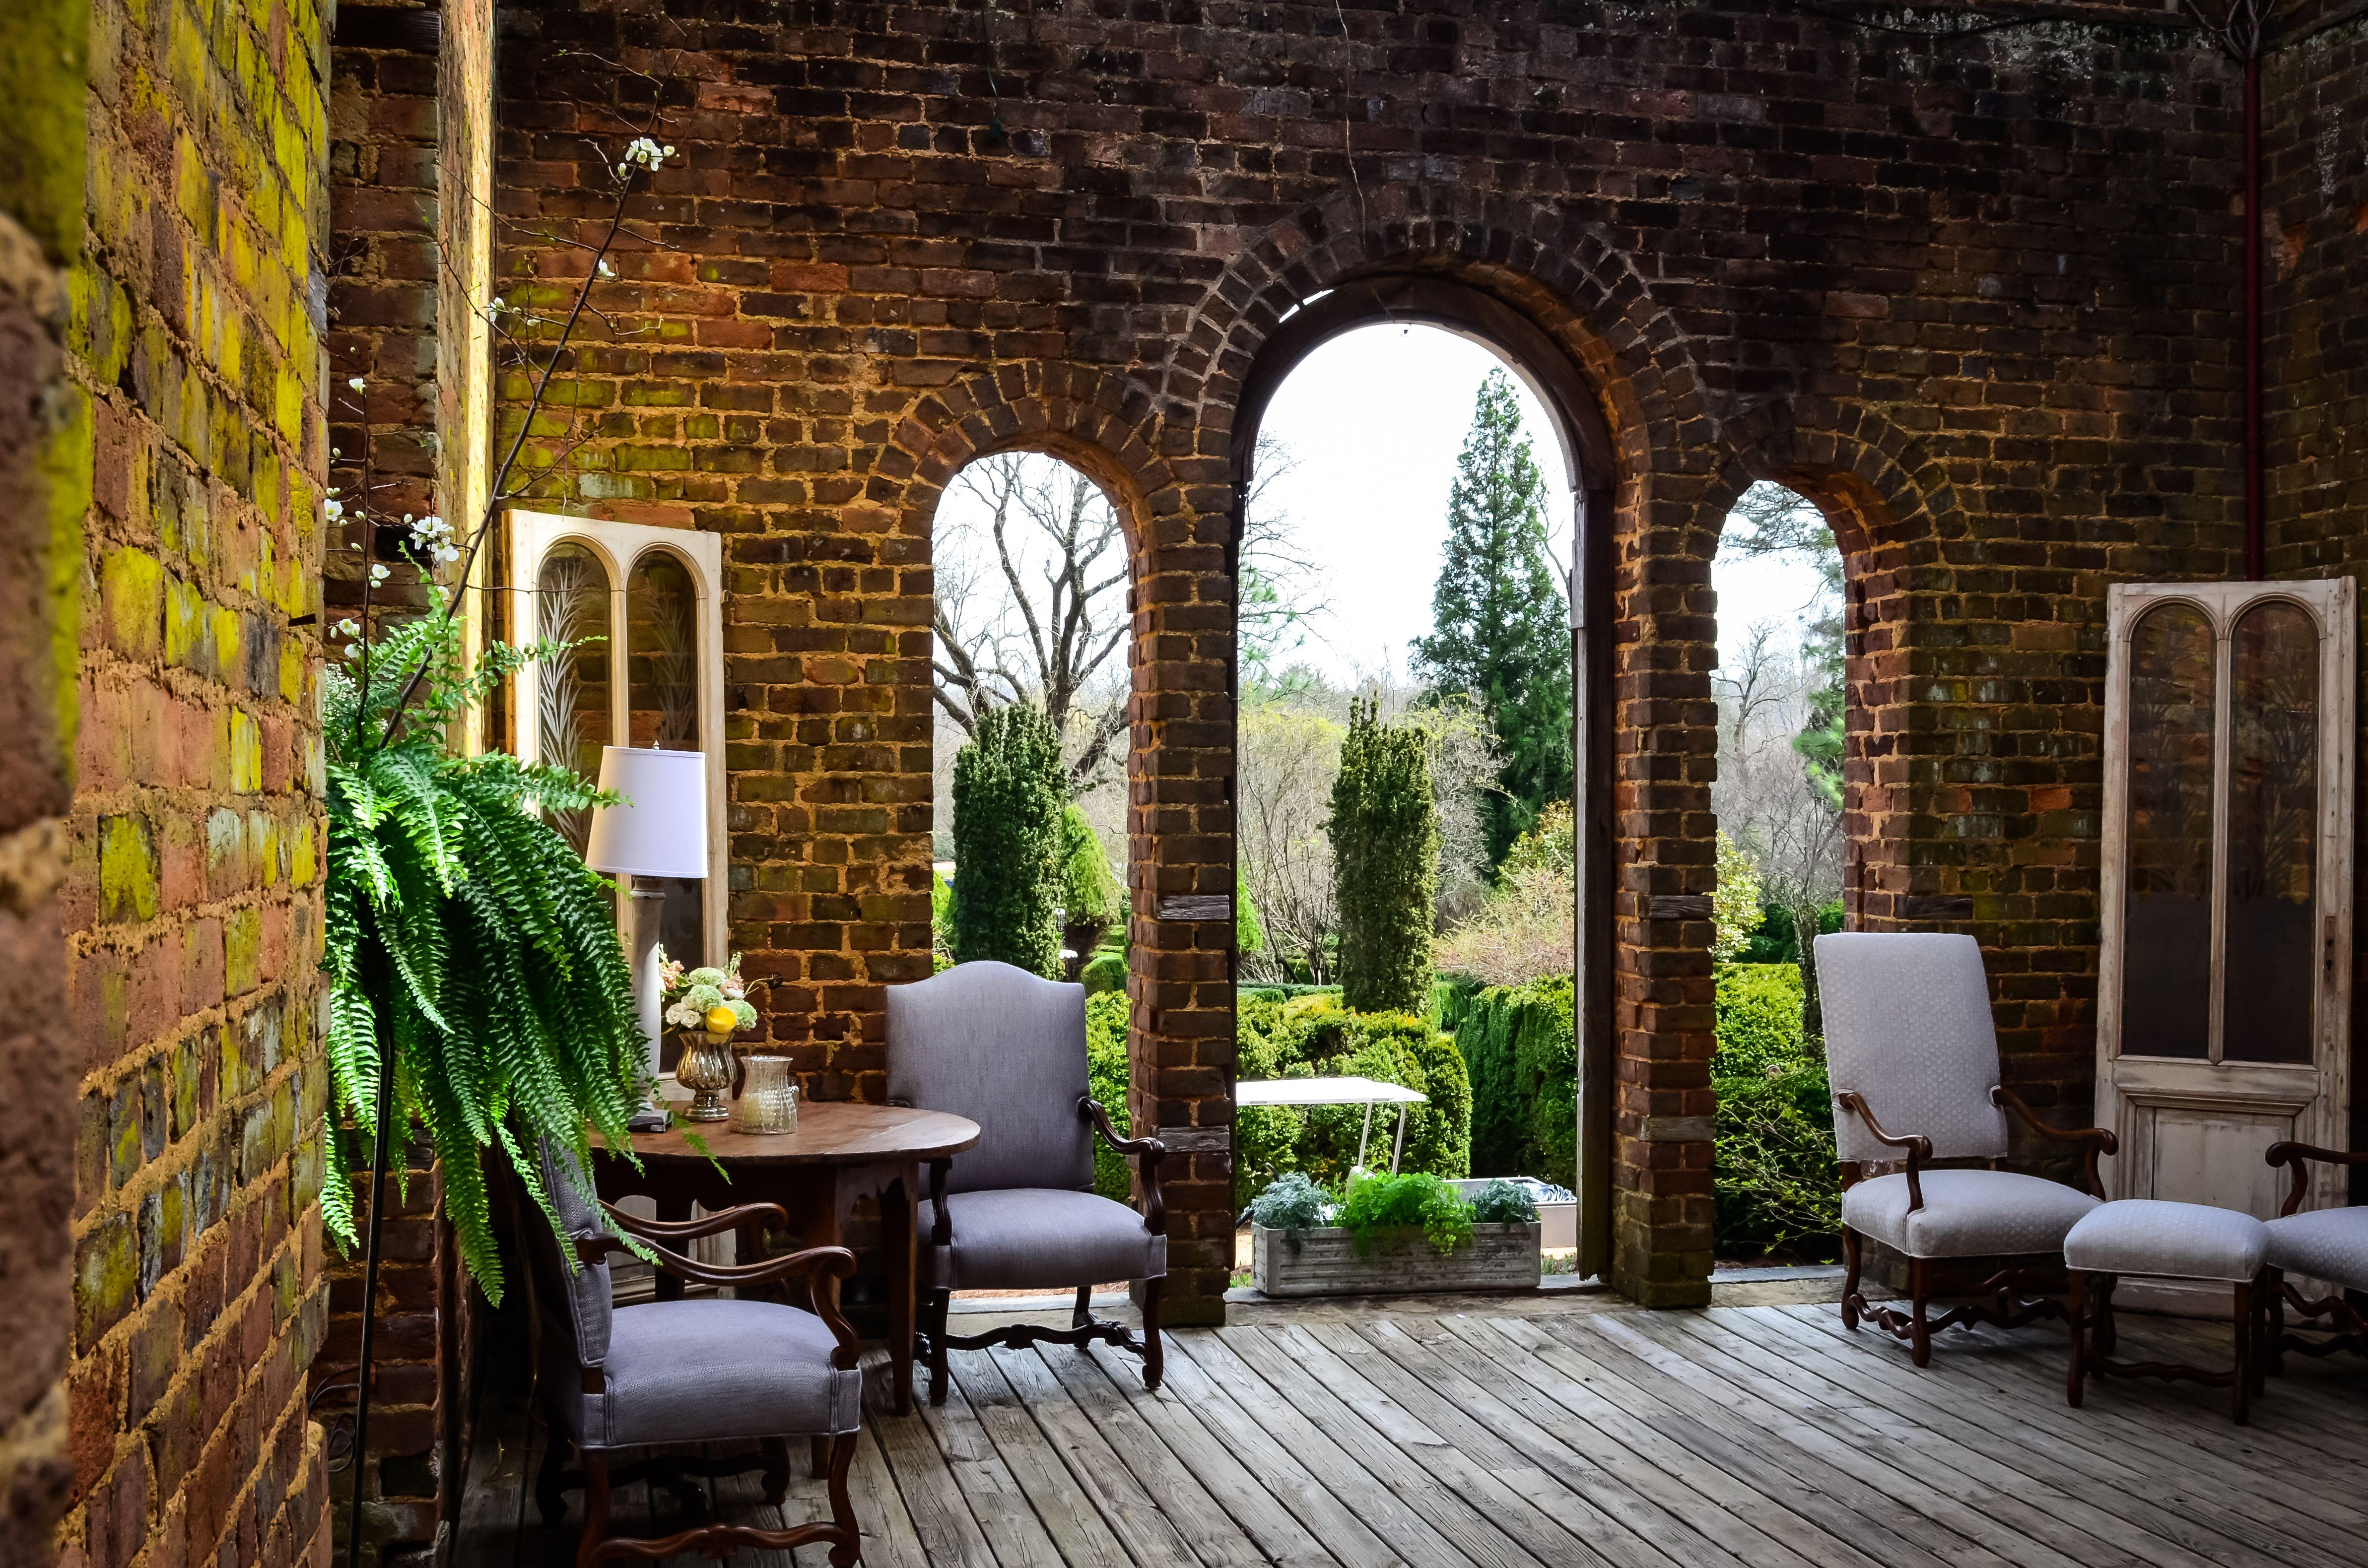 furnished ruins at a vintage spring wedding at barnsley gardens